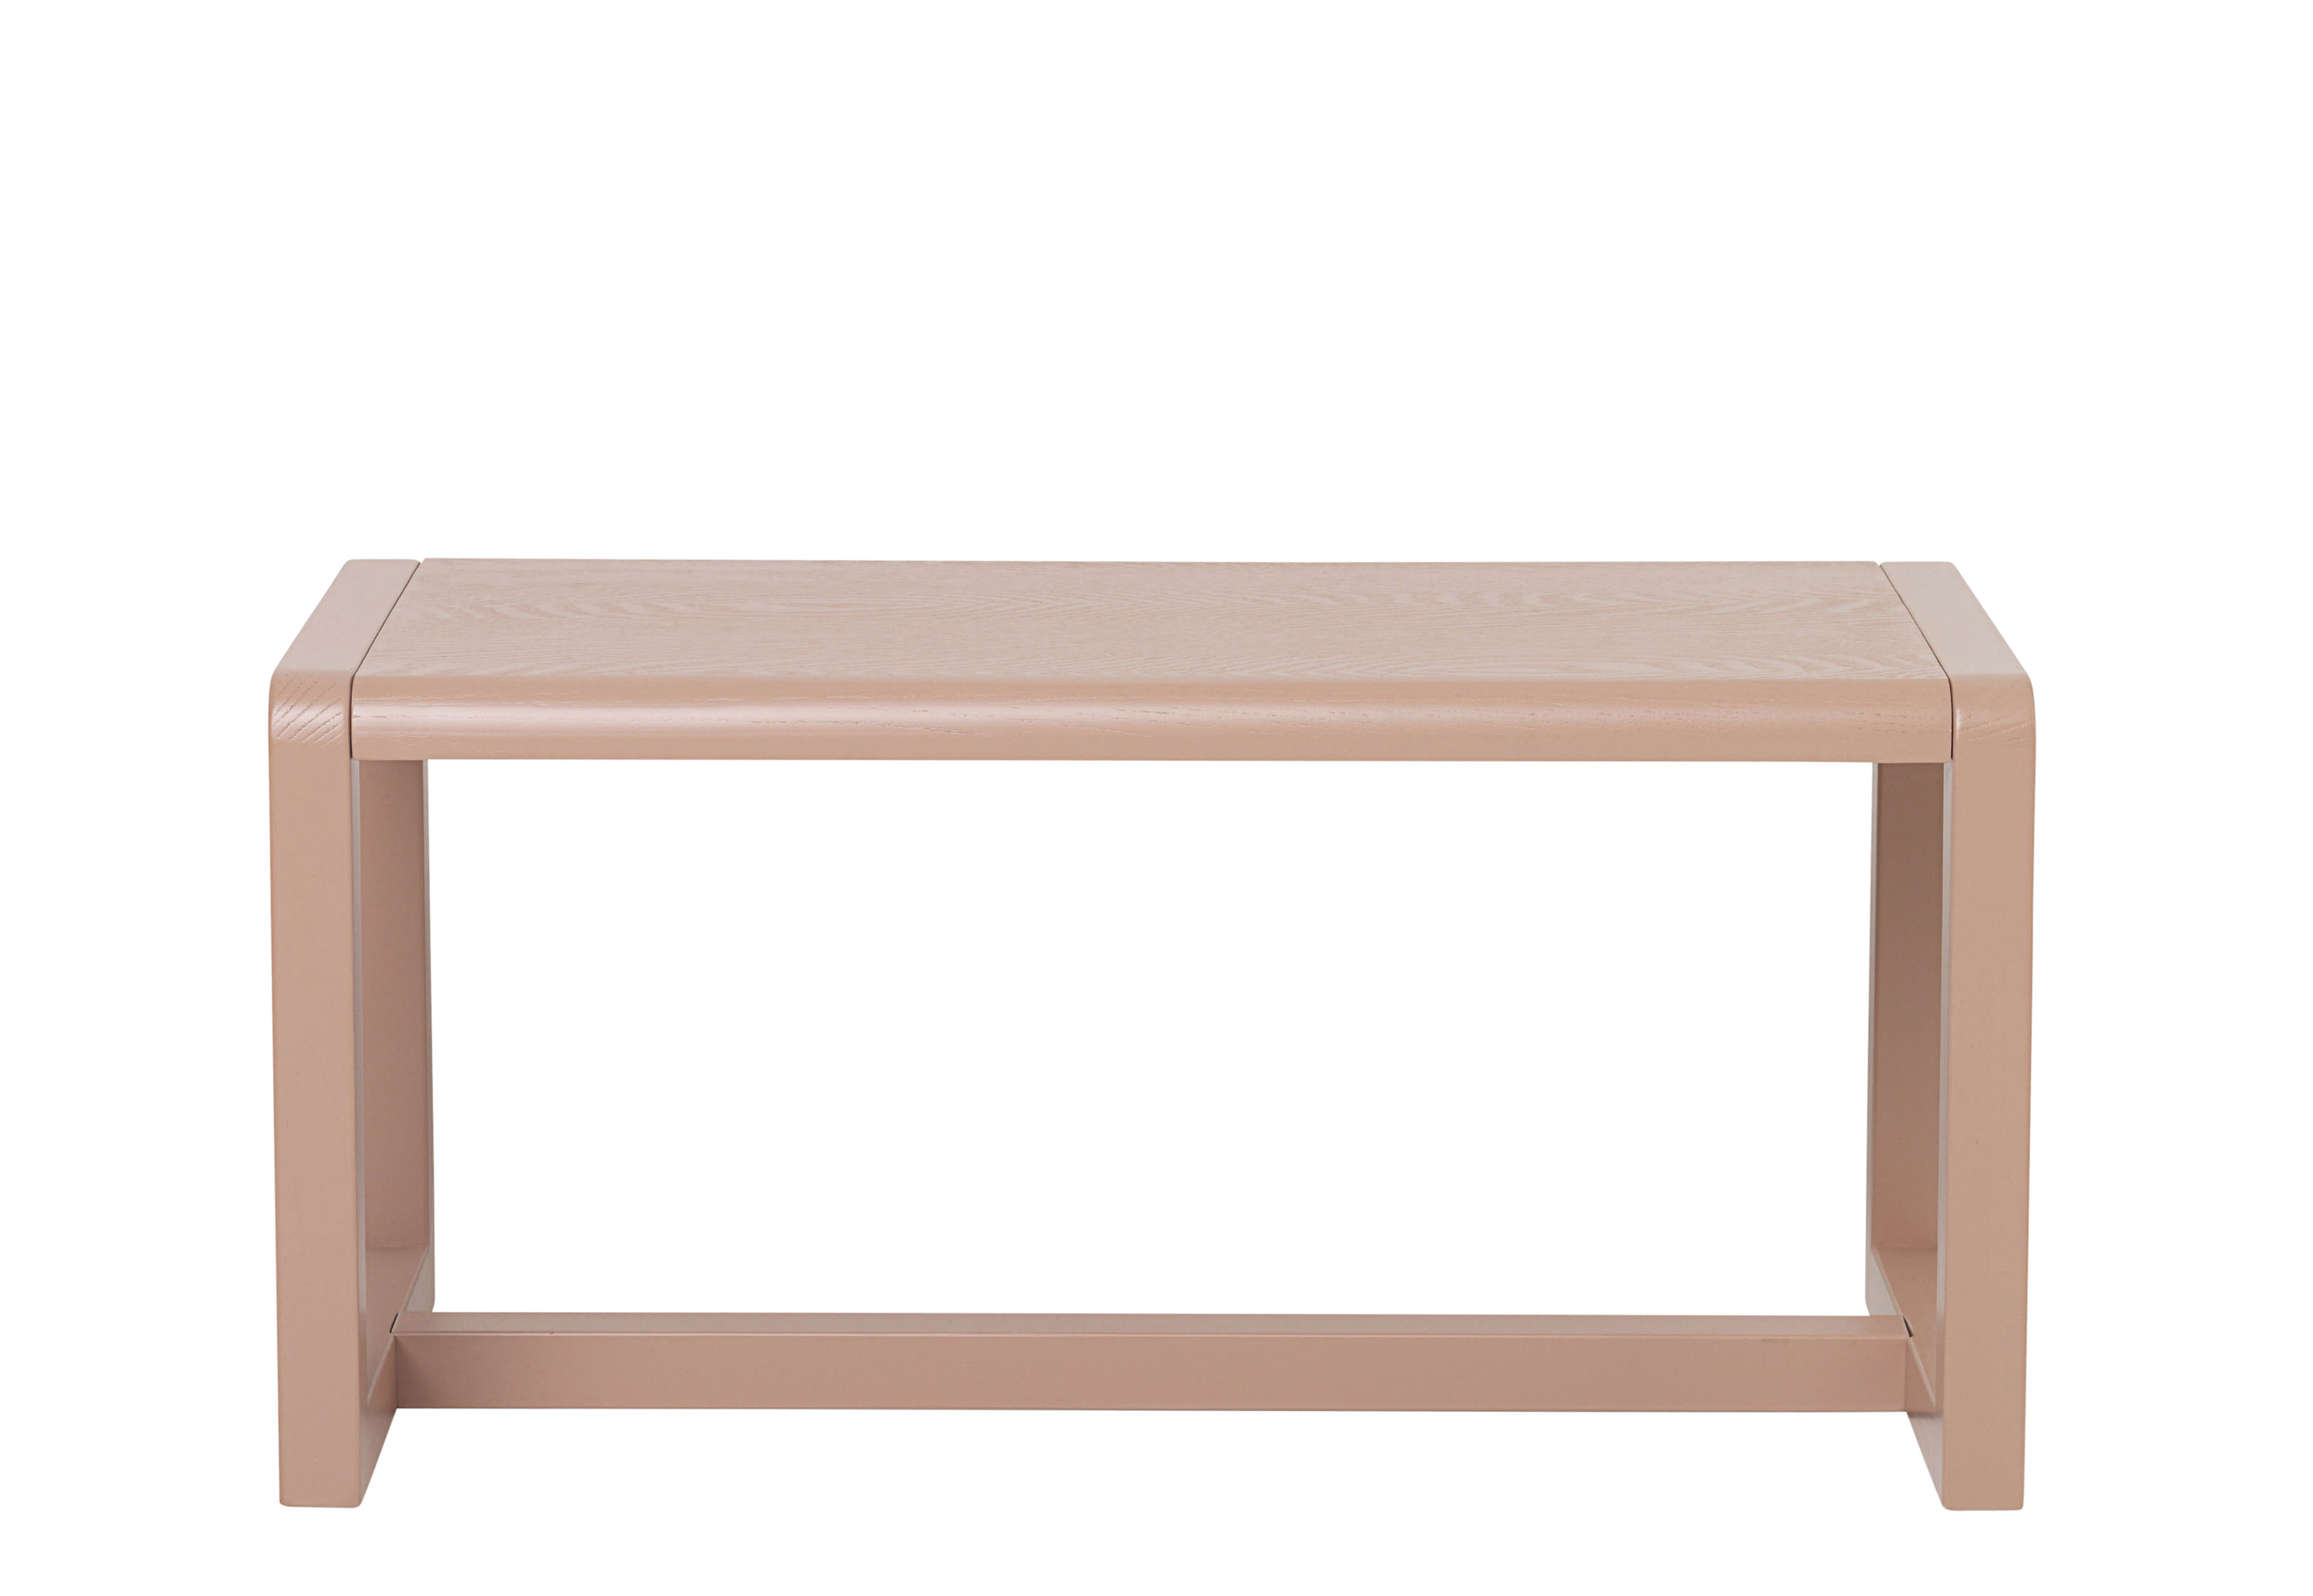 banc enfant little architect bois l 62 cm rose ferm living. Black Bedroom Furniture Sets. Home Design Ideas